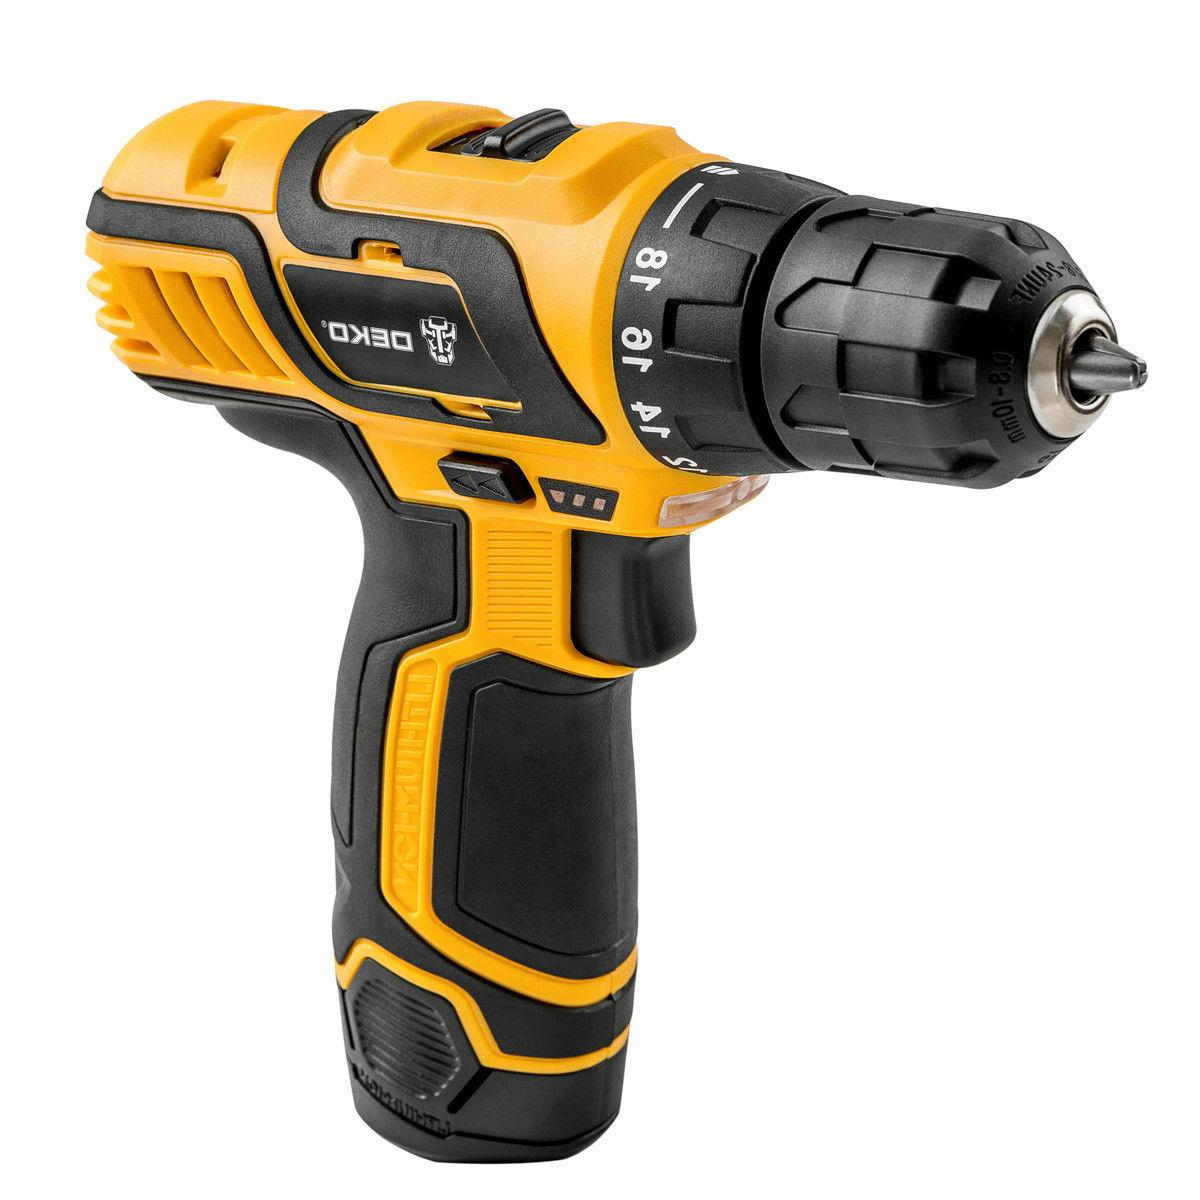 "DEKO 18+1 3/8"" Electric Cordless 2-Speed Drill"